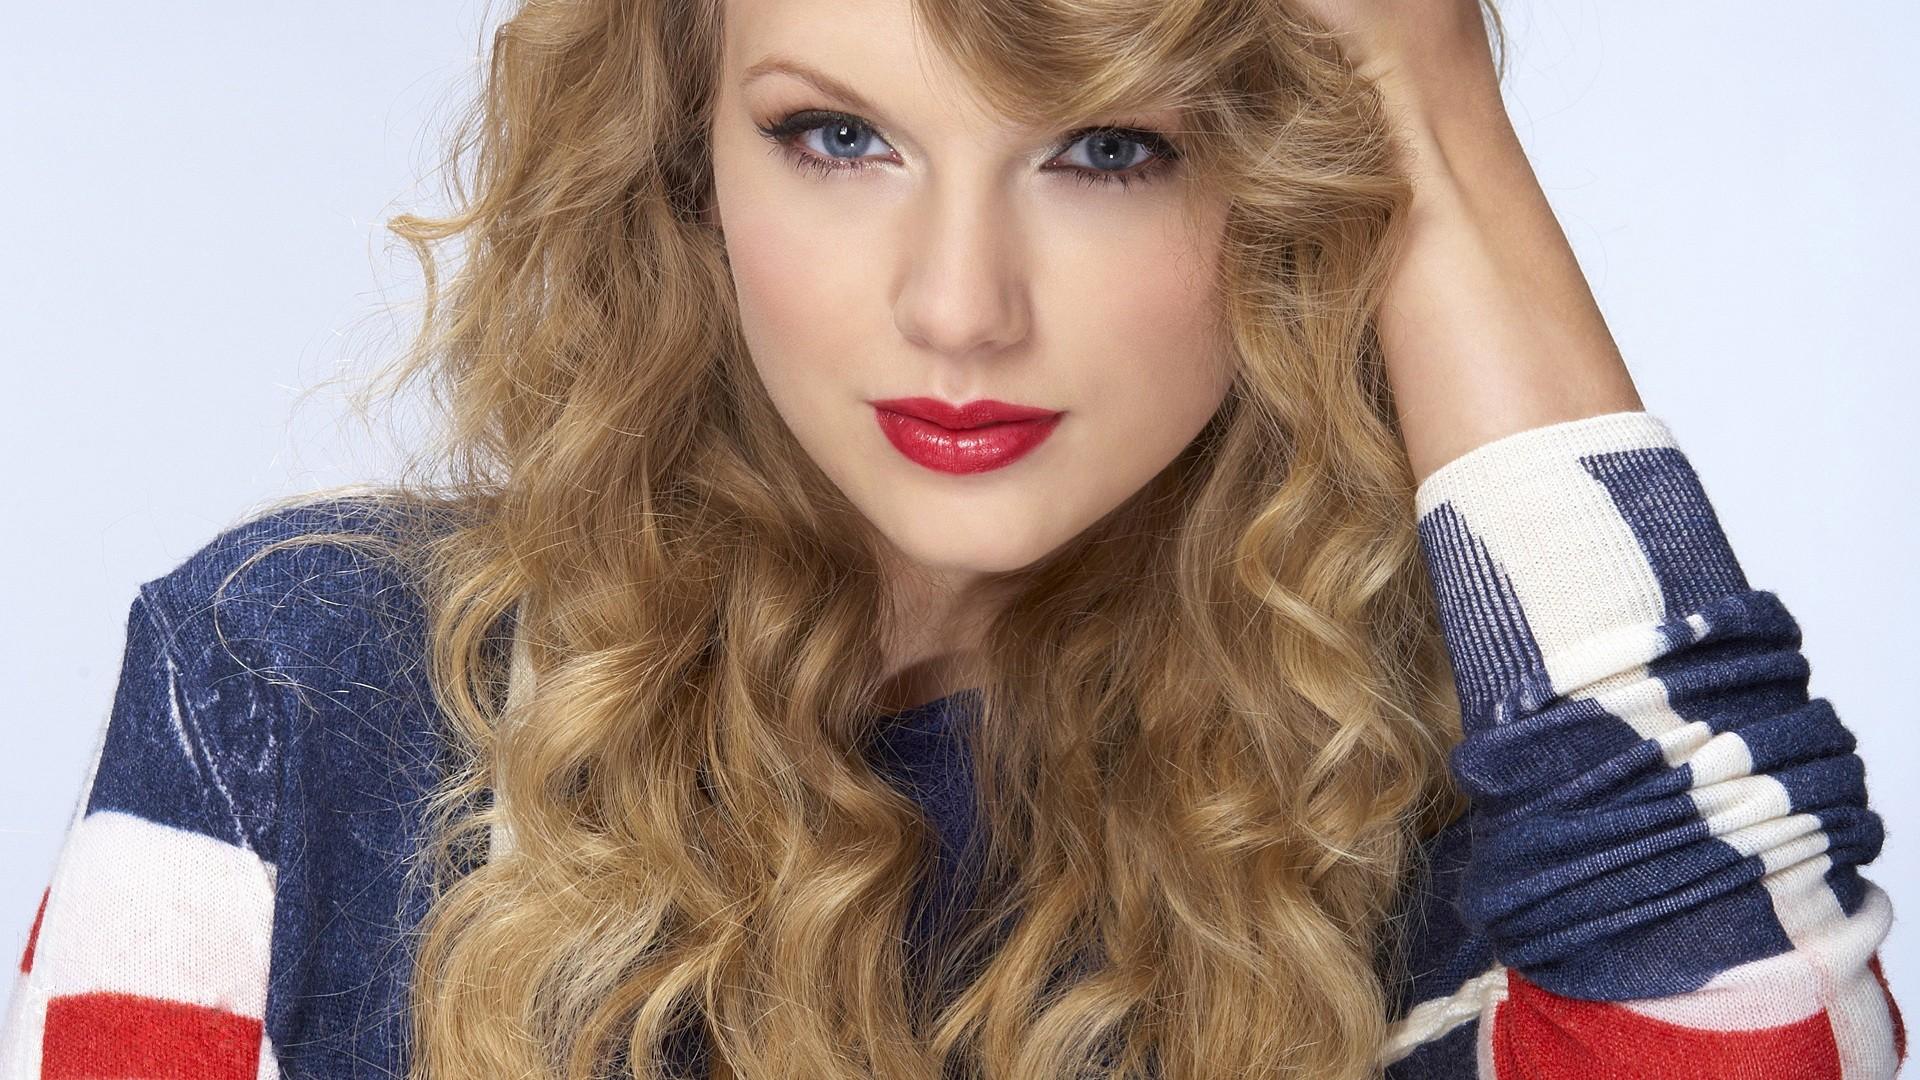 Red Lipstick Brown Hair Blue Eyes: Sfondi : Viso, Donne, Modello, Bionda, Capelli Lunghi